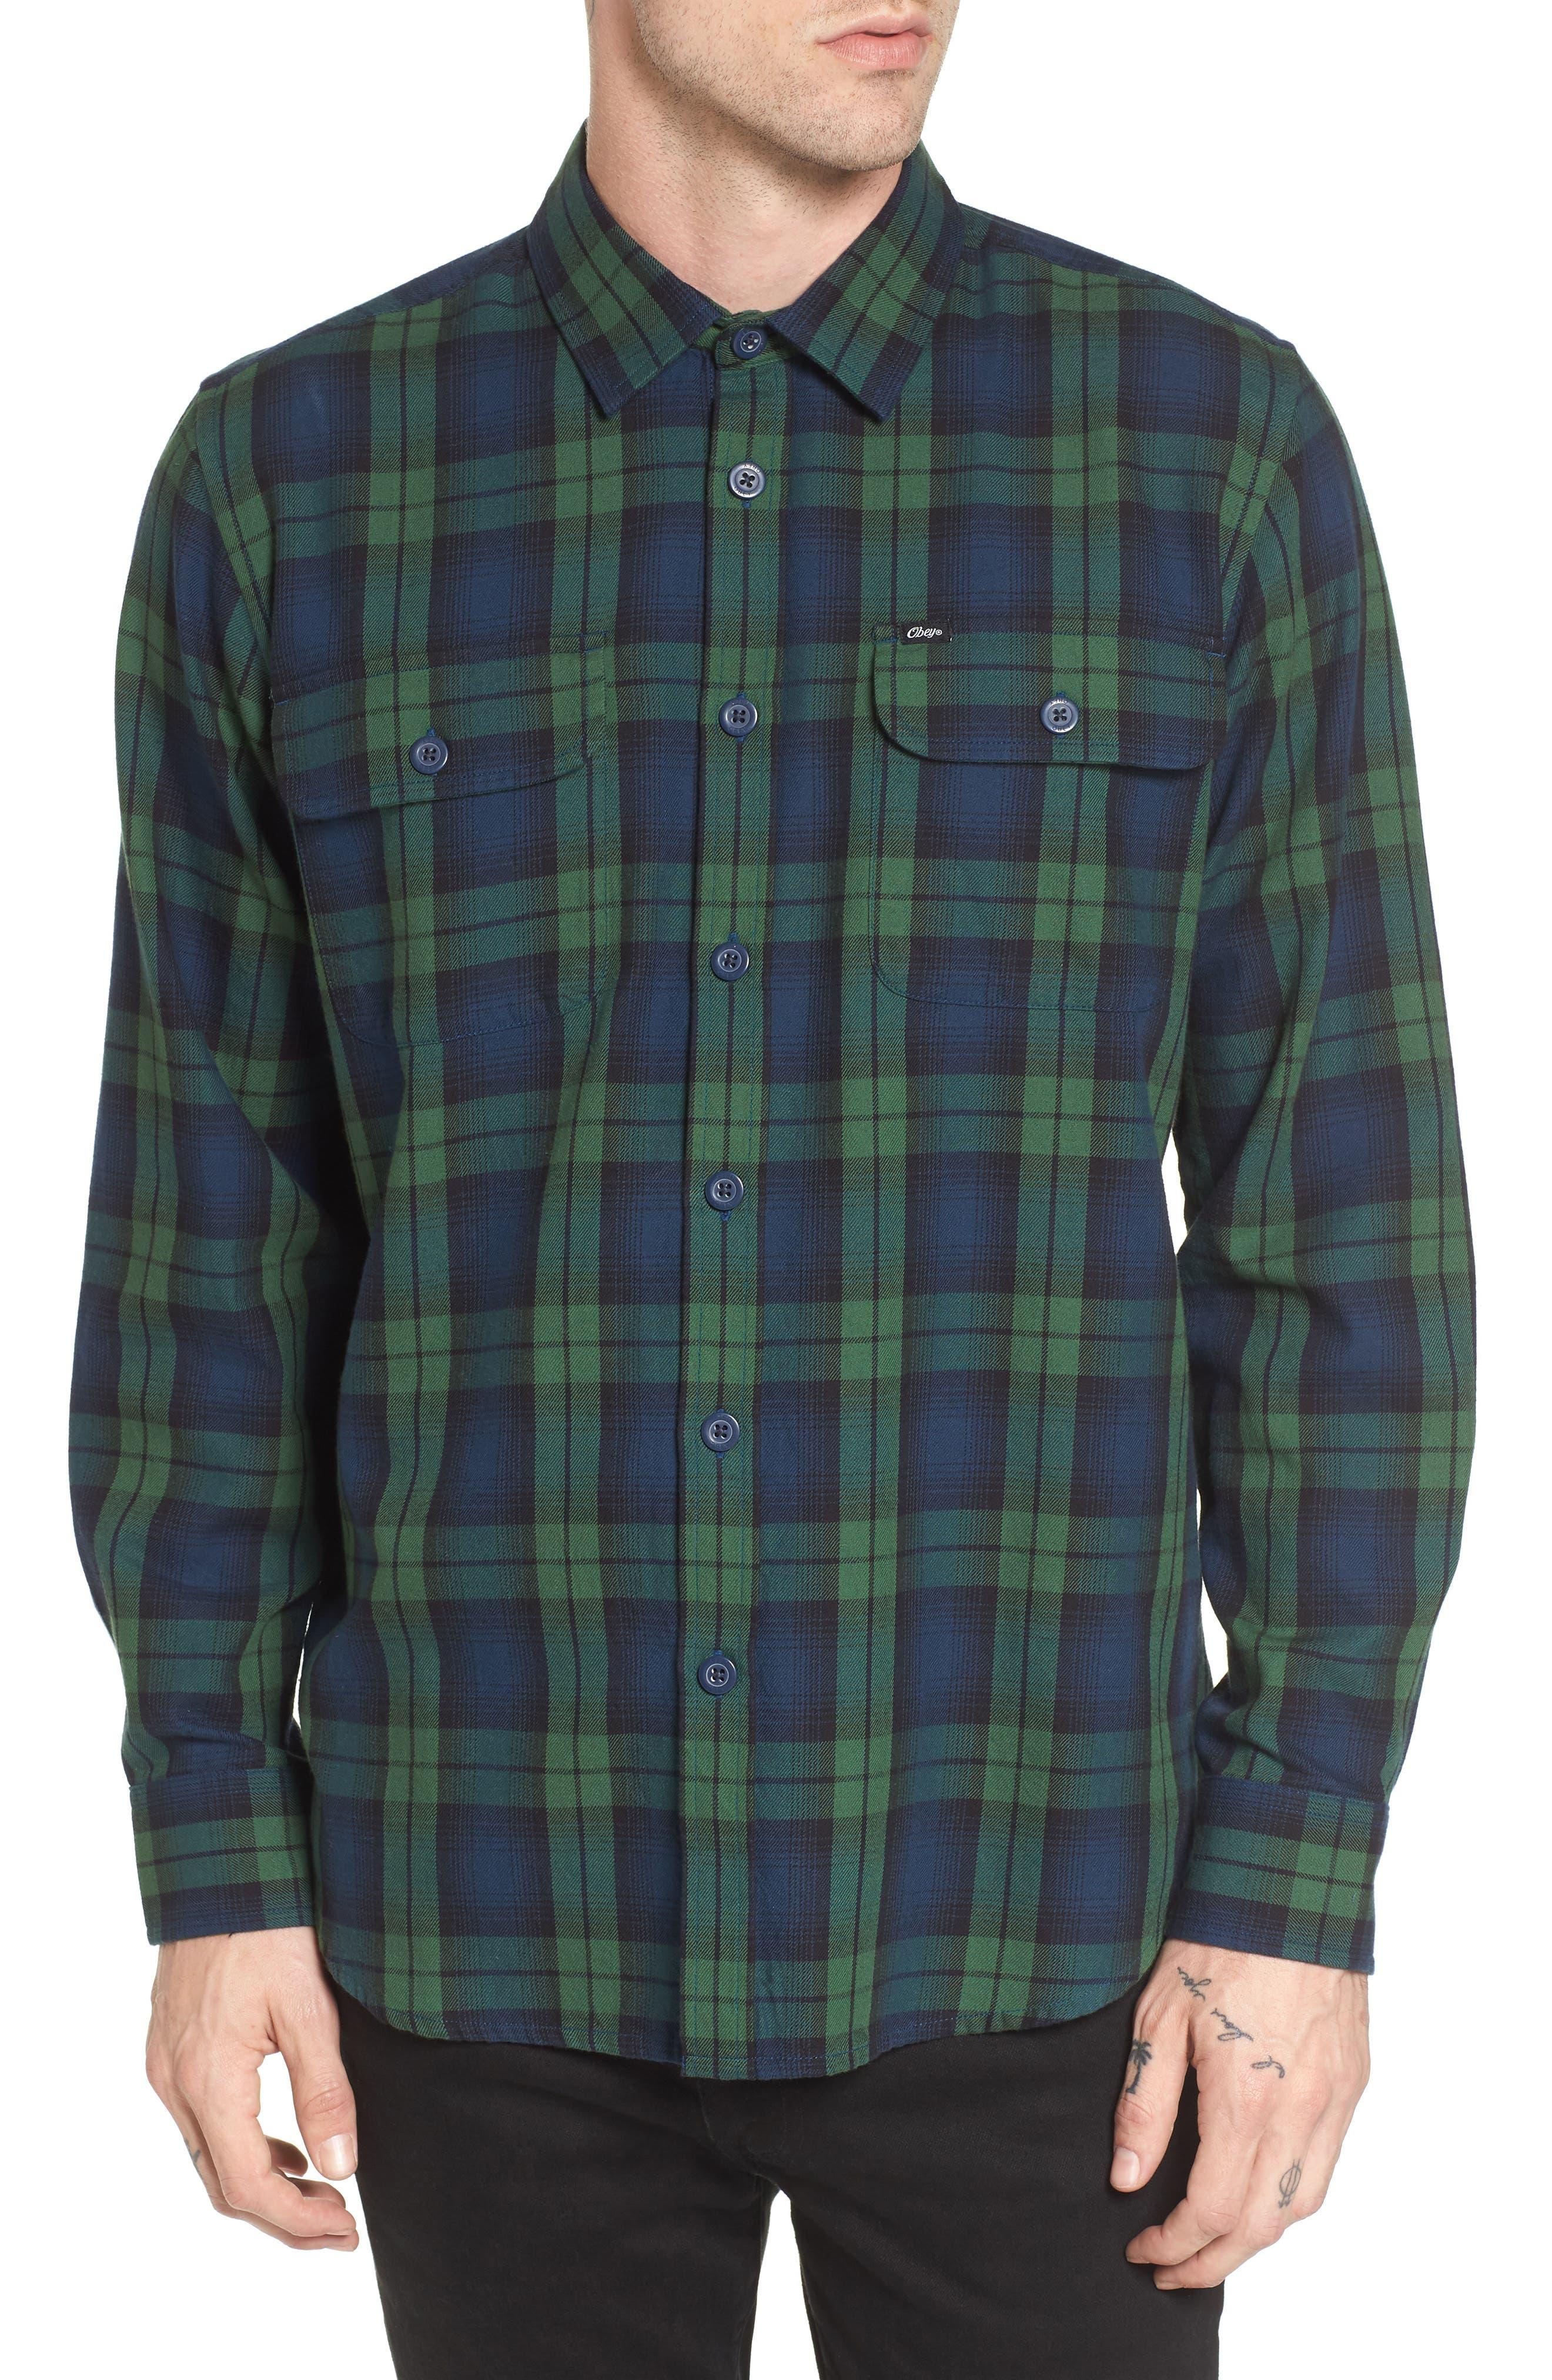 Norwich Plaid Woven Shirt,                             Main thumbnail 1, color,                             303